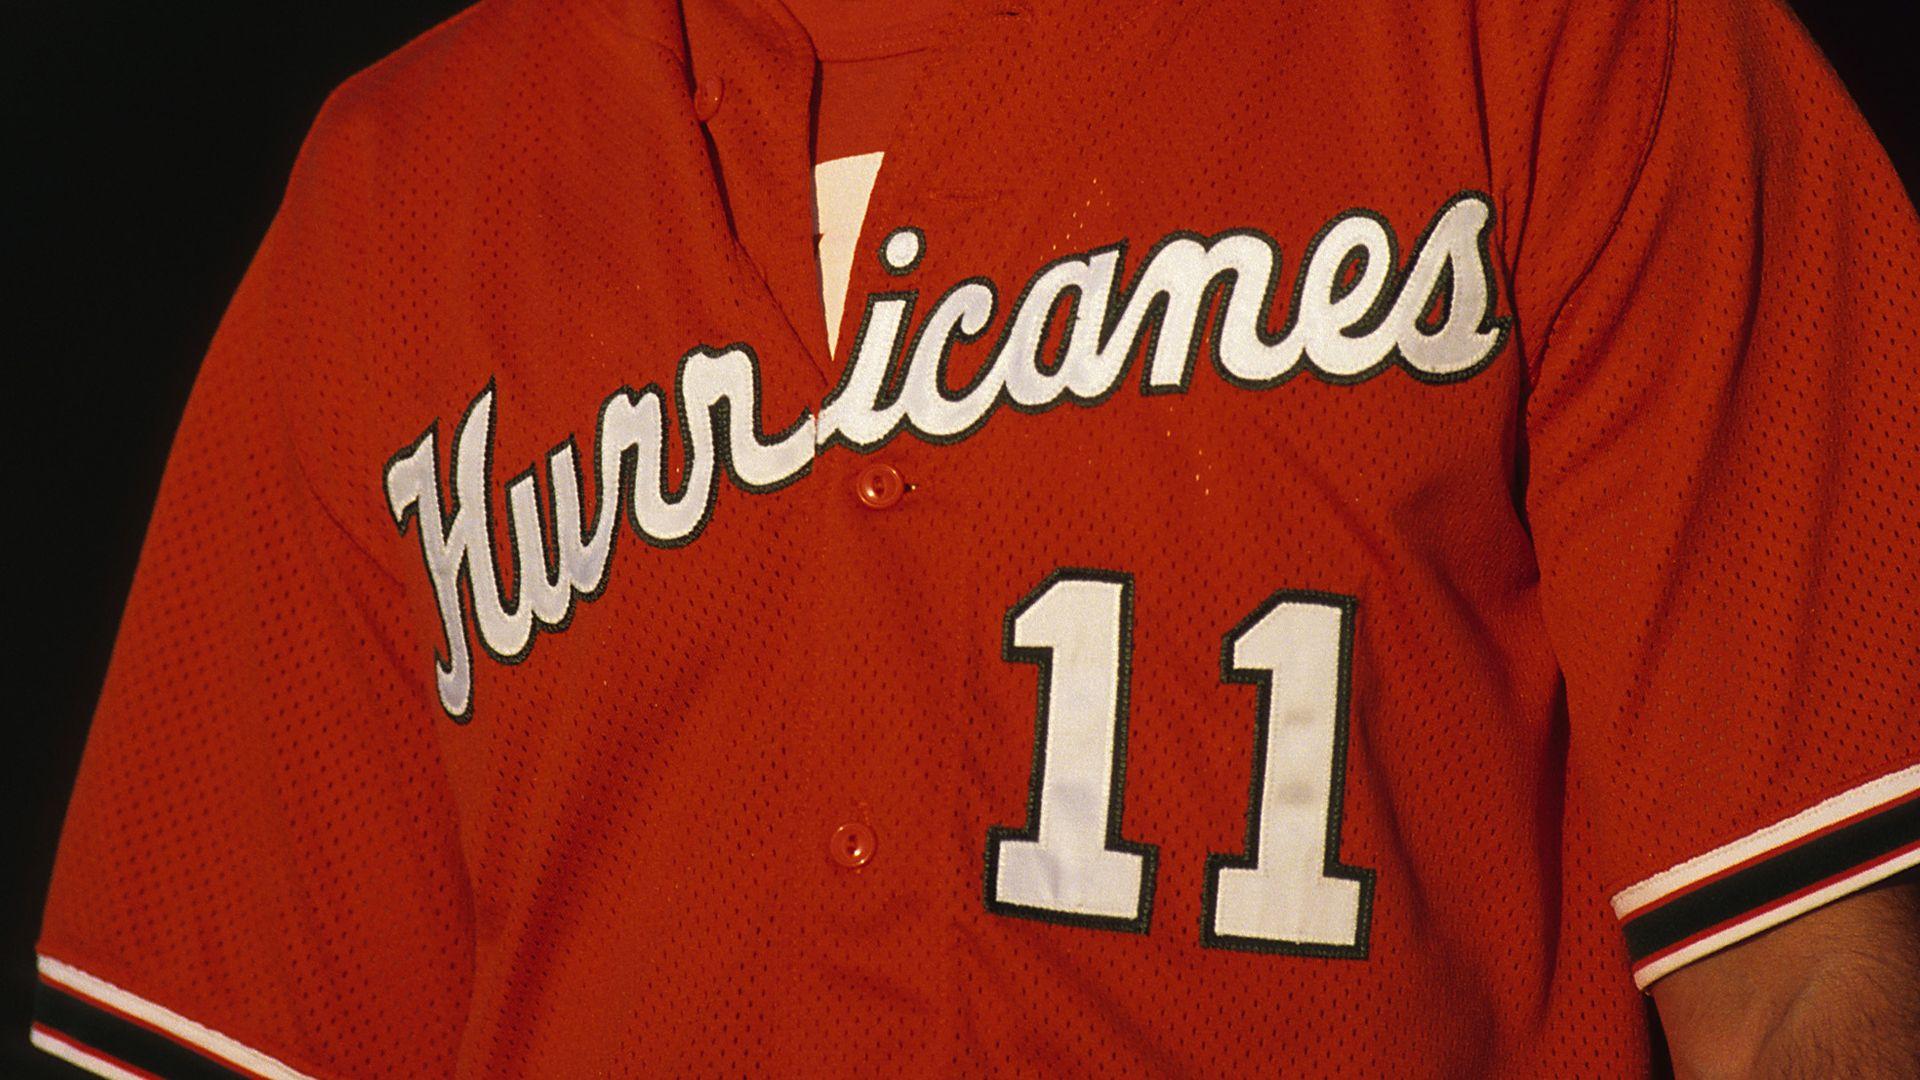 Canes Ranked No. 11 by Baseball America